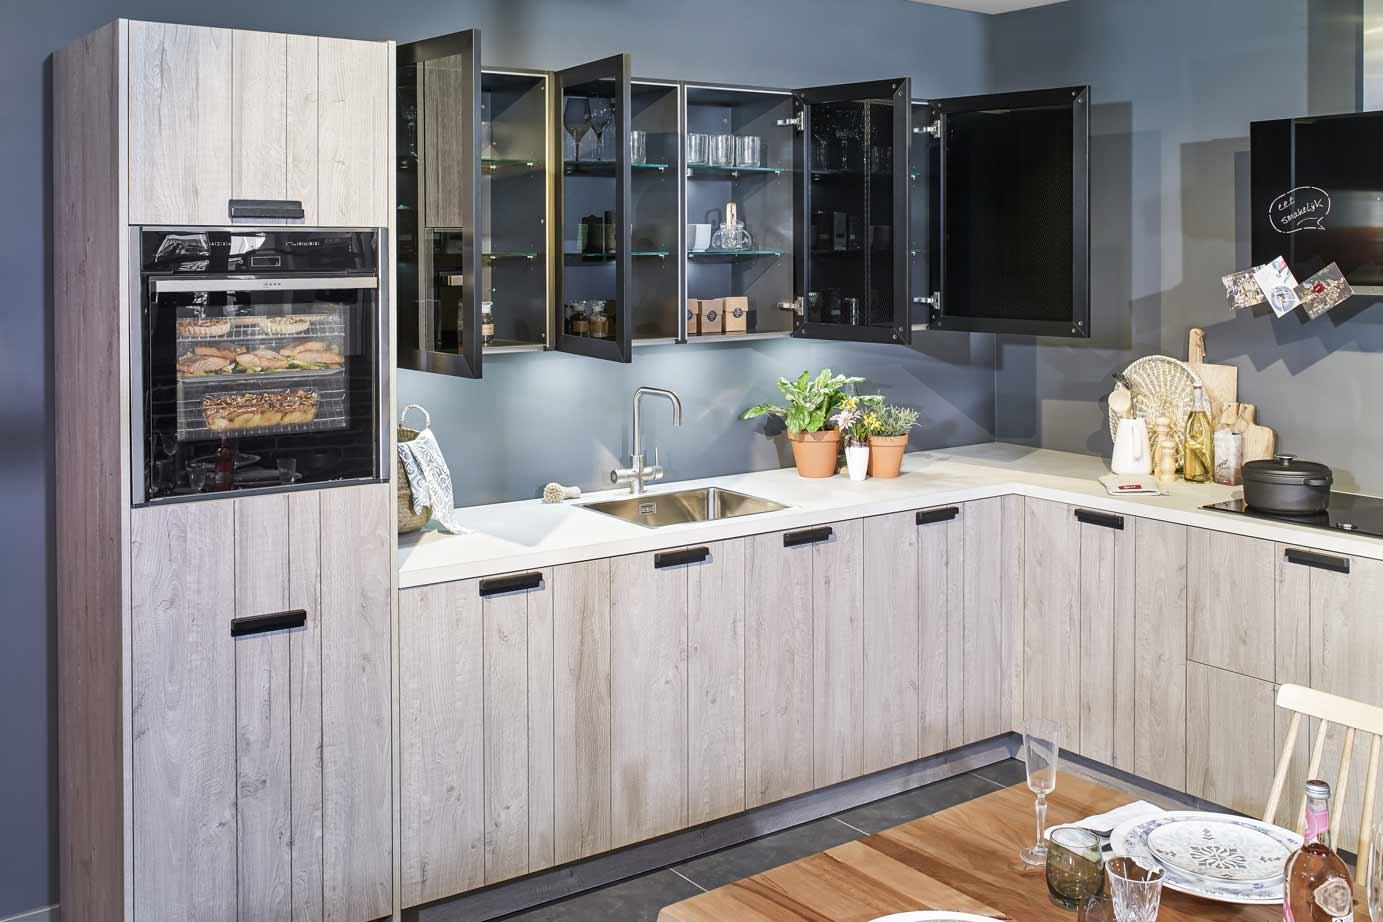 Industriële houten keuken inclusief neff apparatuur db keukens